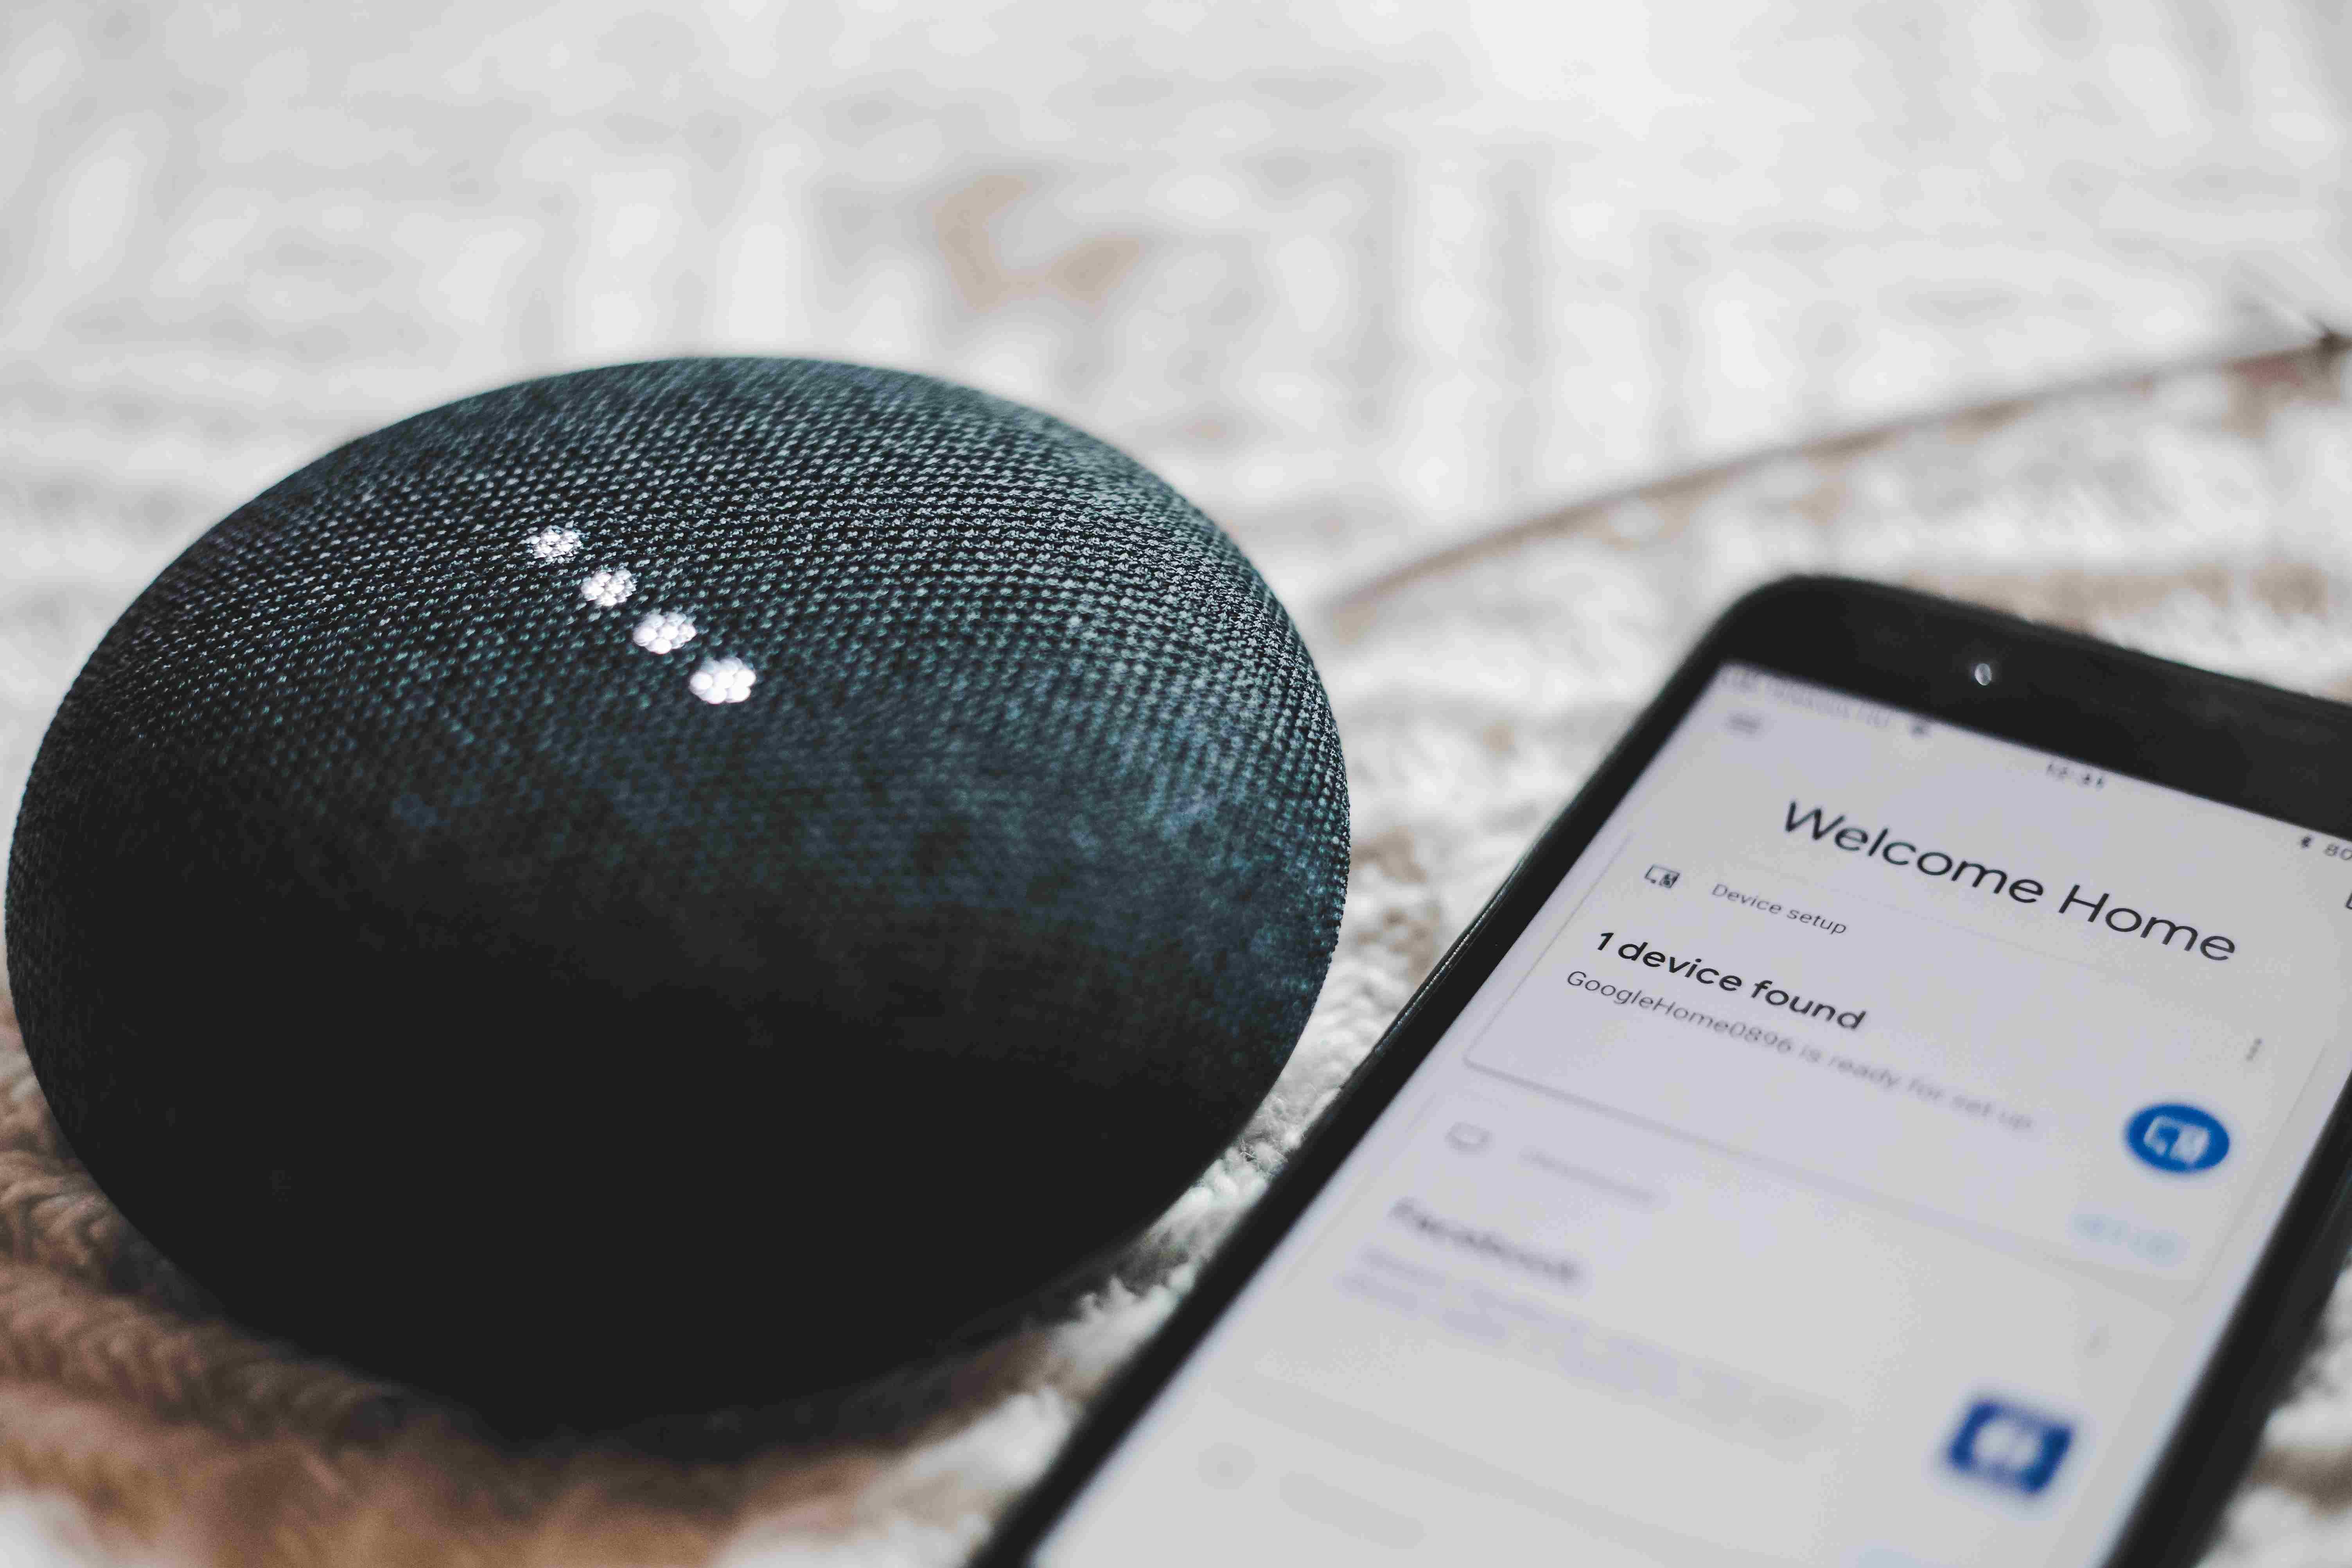 IoT Smart House